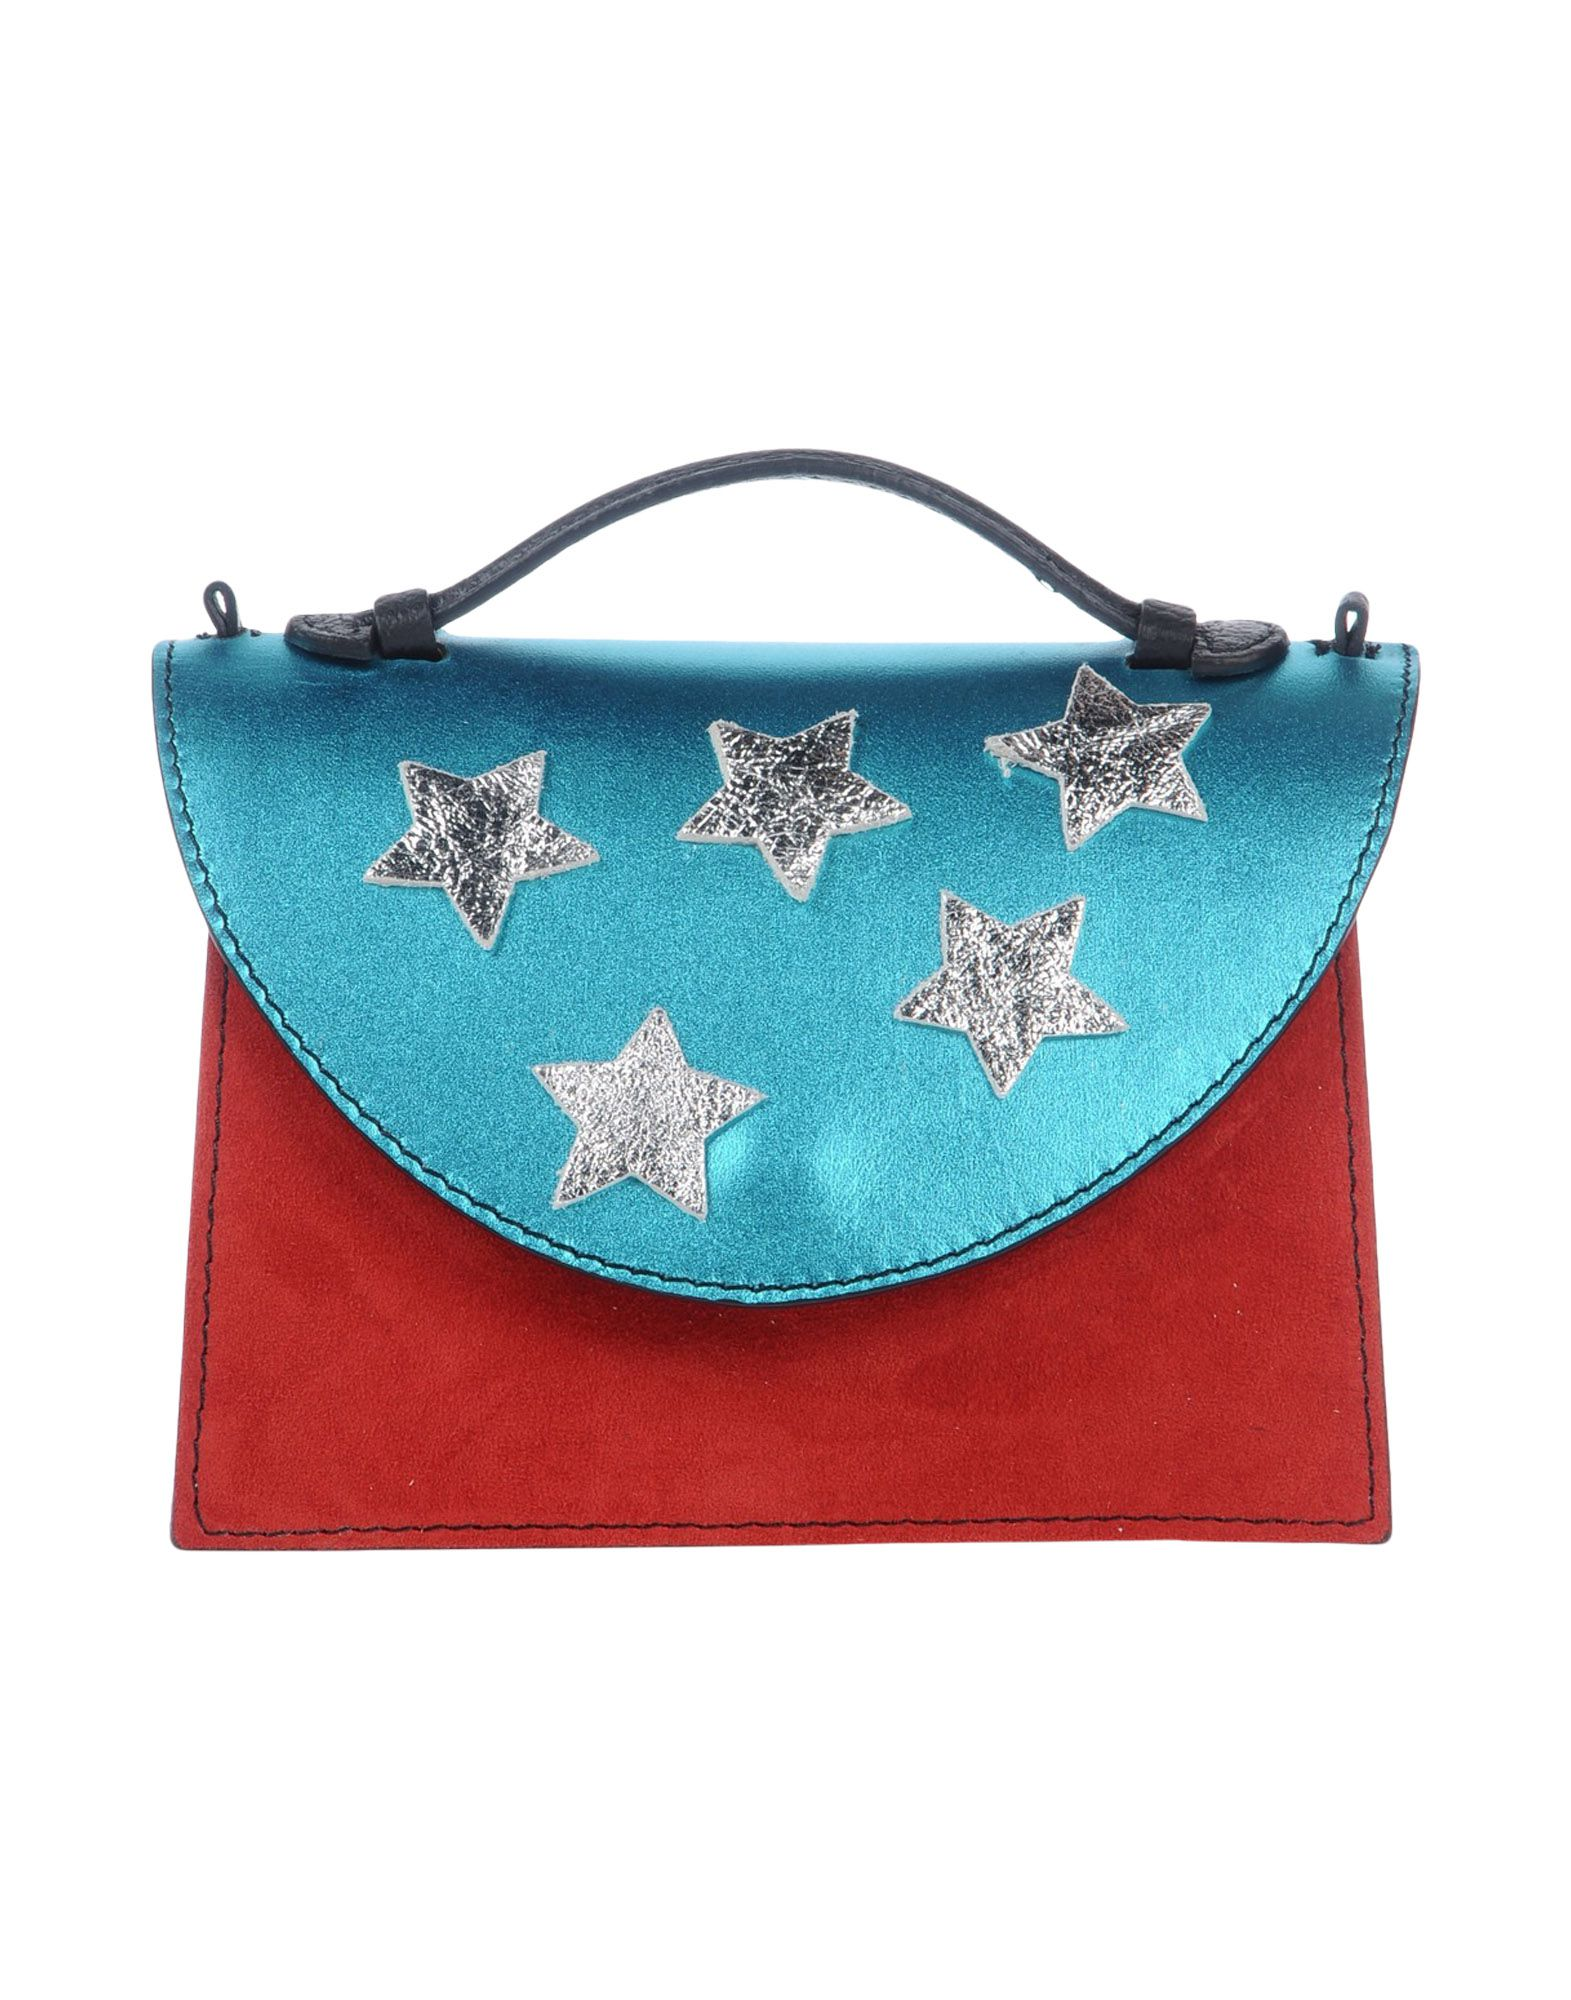 IMEMOI Handbag in Turquoise